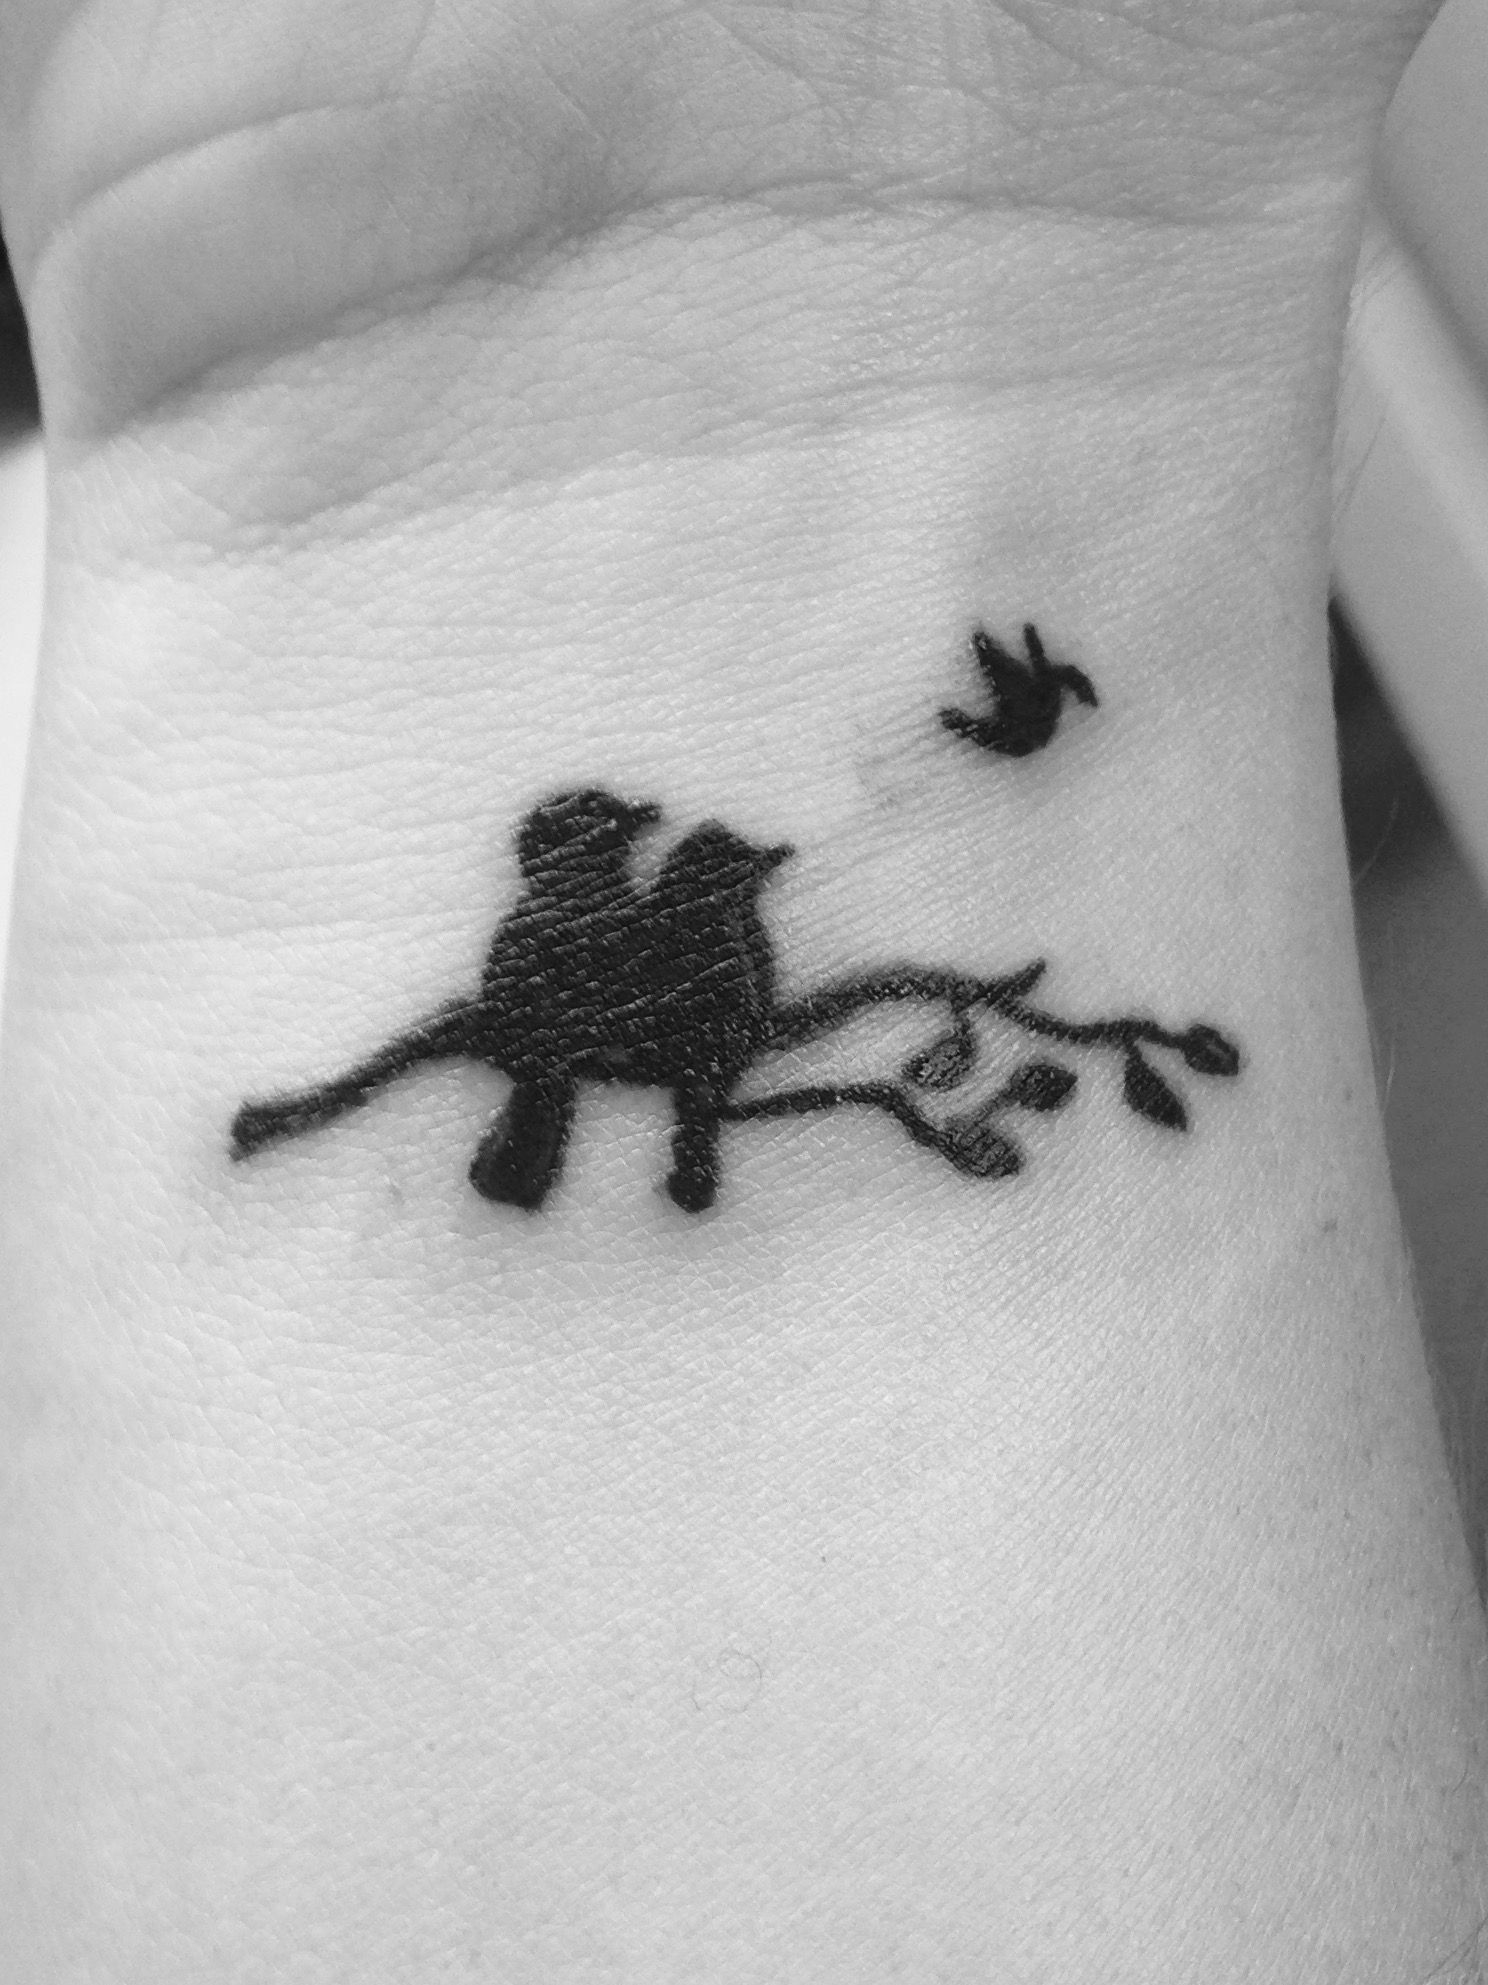 Miscarriage Tattoos For Guys : miscarriage, tattoos, Tattoo, Ideas